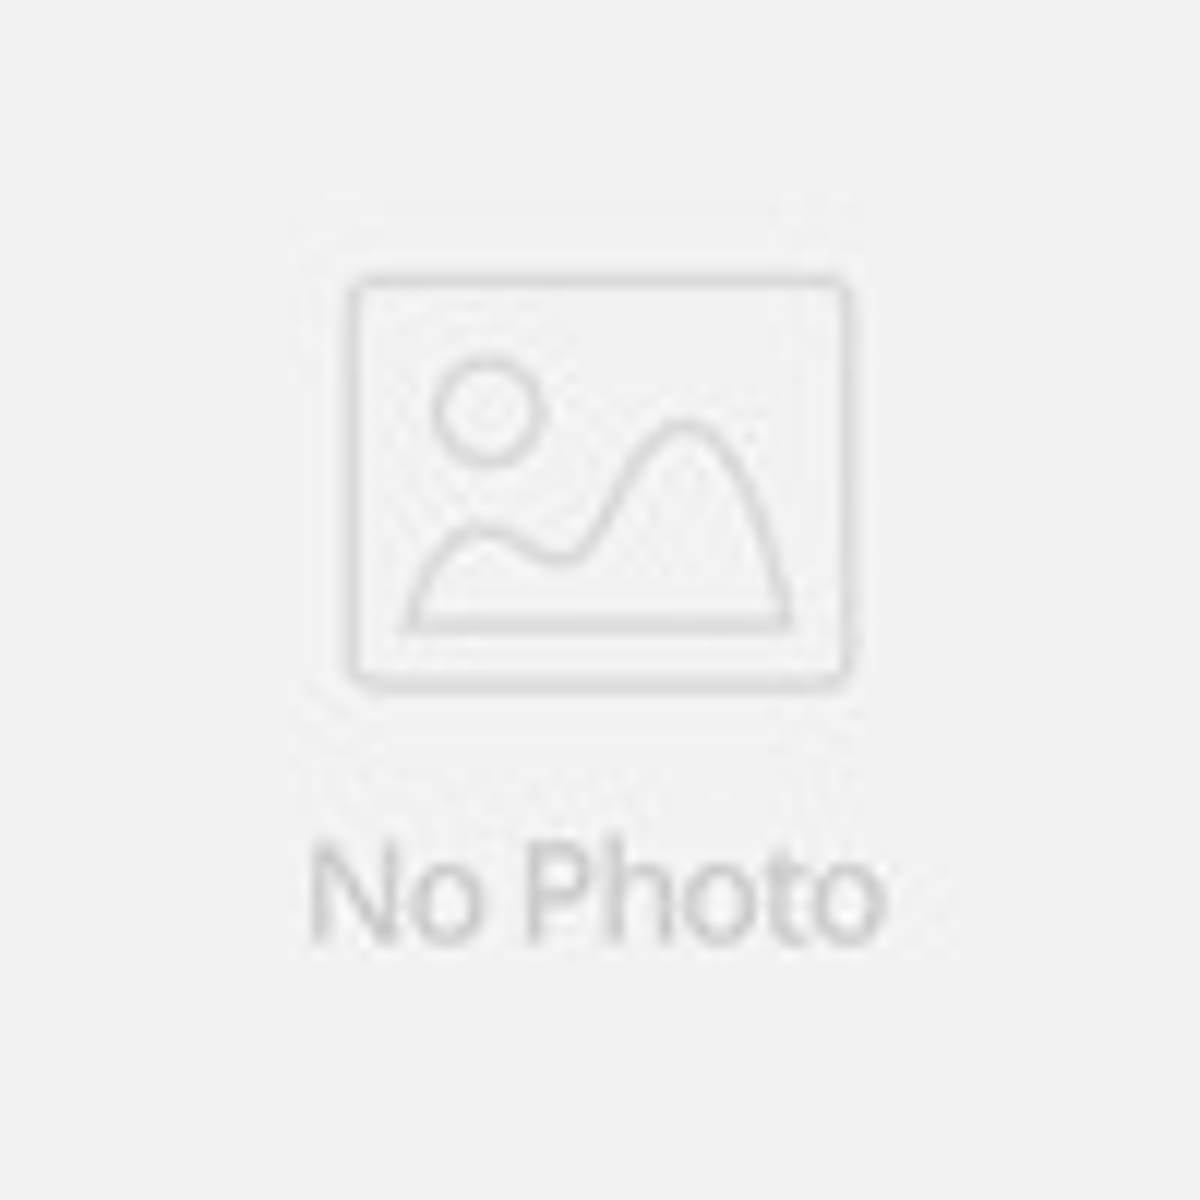 Porcelain fashion quality photo frame ceramic photo frame photo frame 3303a(China (Mainland))